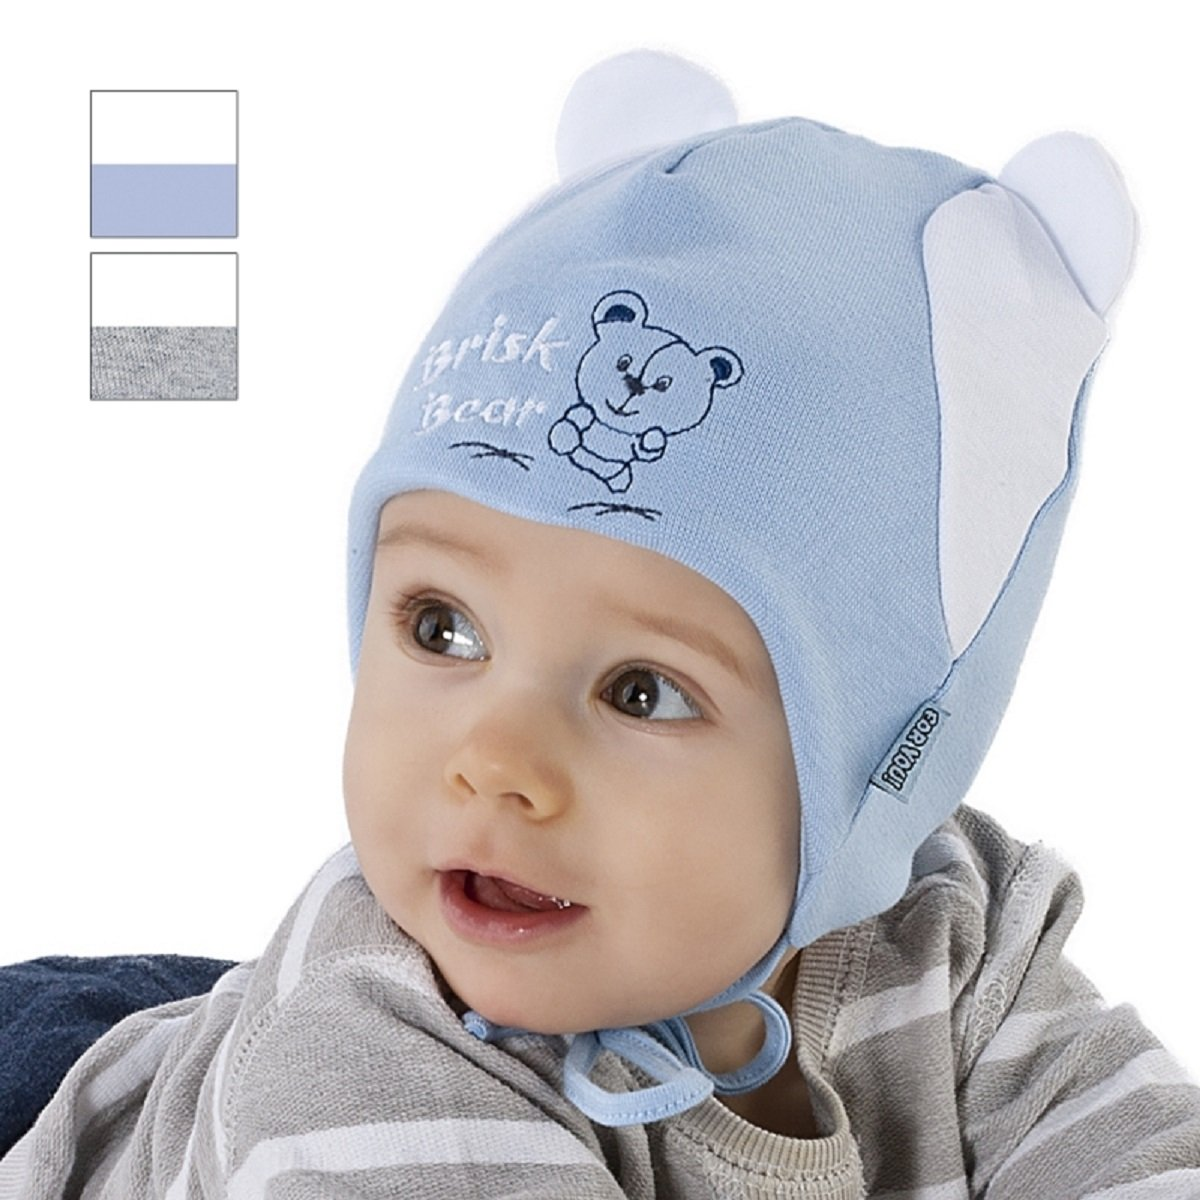 New Baby Boy Hat Boys Spring Autumn Peak Cap Christening Baptism Hat 0-12 mths 0-2 Months 38cm, White